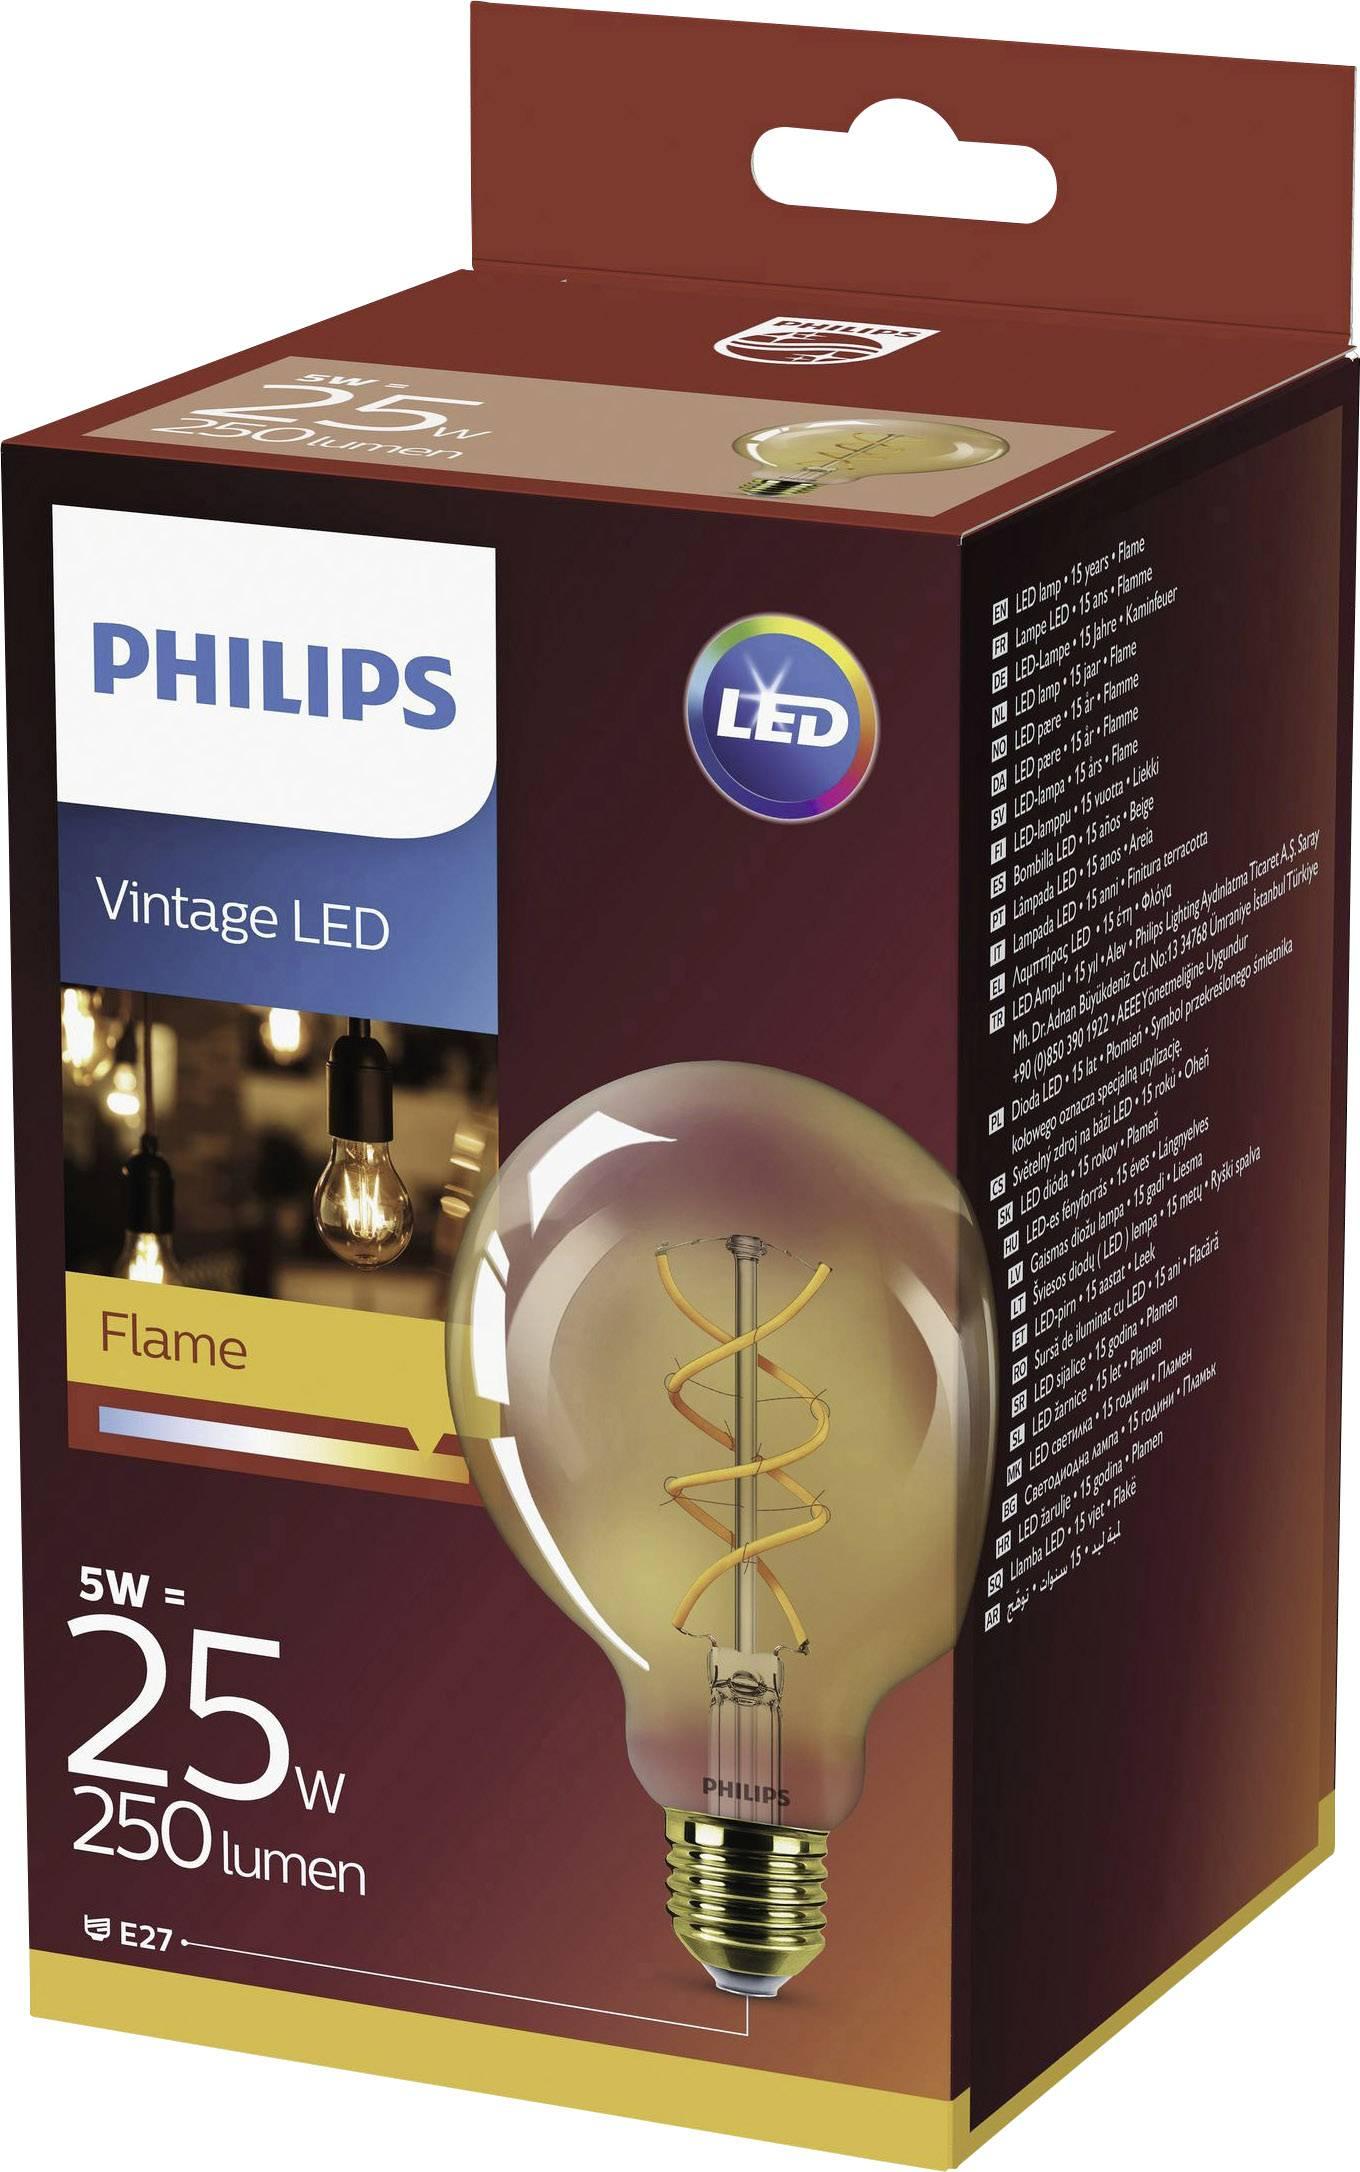 AaEE27 Globe 5 Led Eec Lighting W25 De Forme En Philips nOwvNy80m